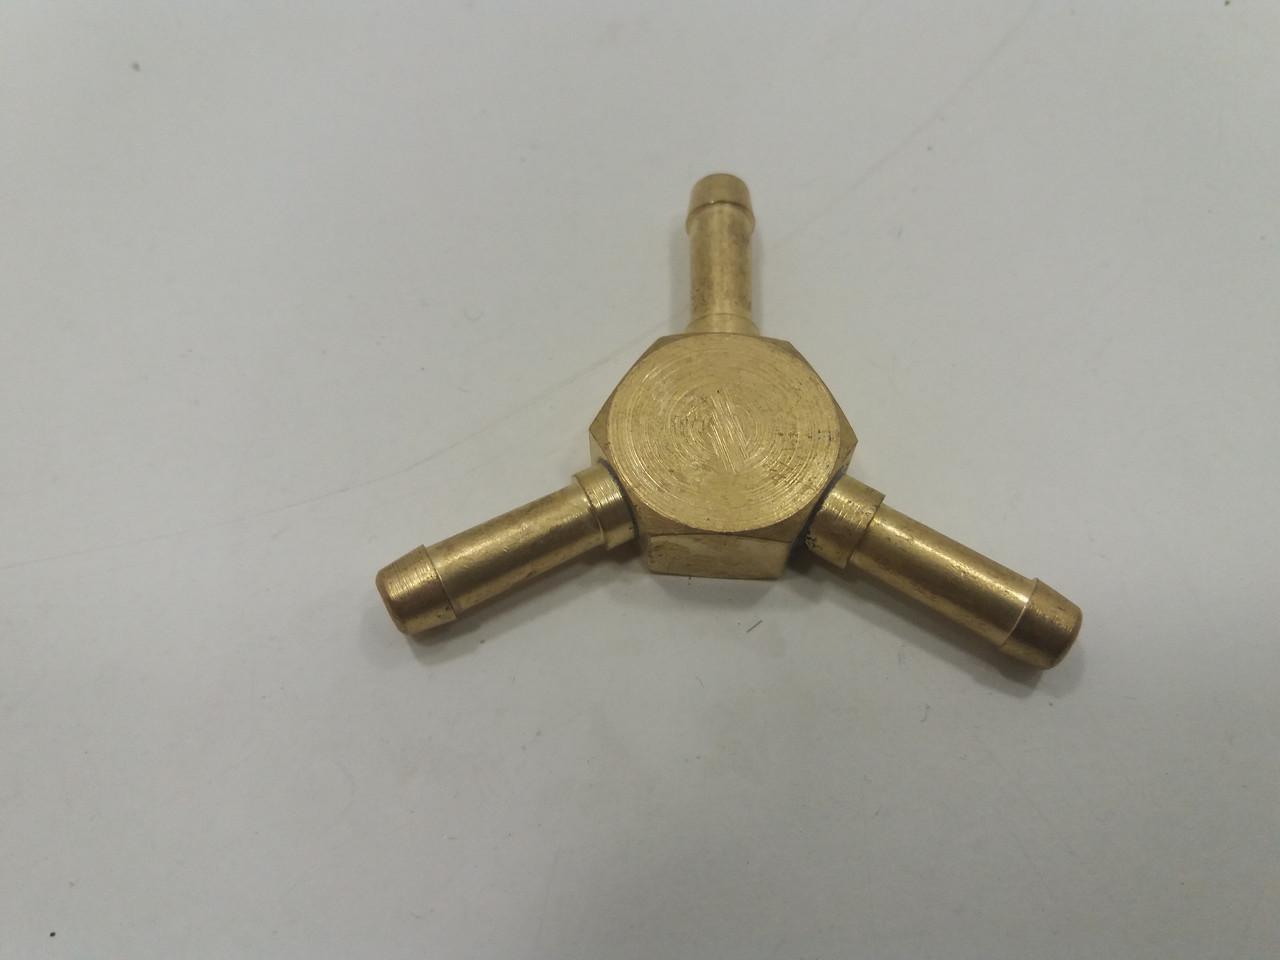 Тройник латунный 6-6-6 мм